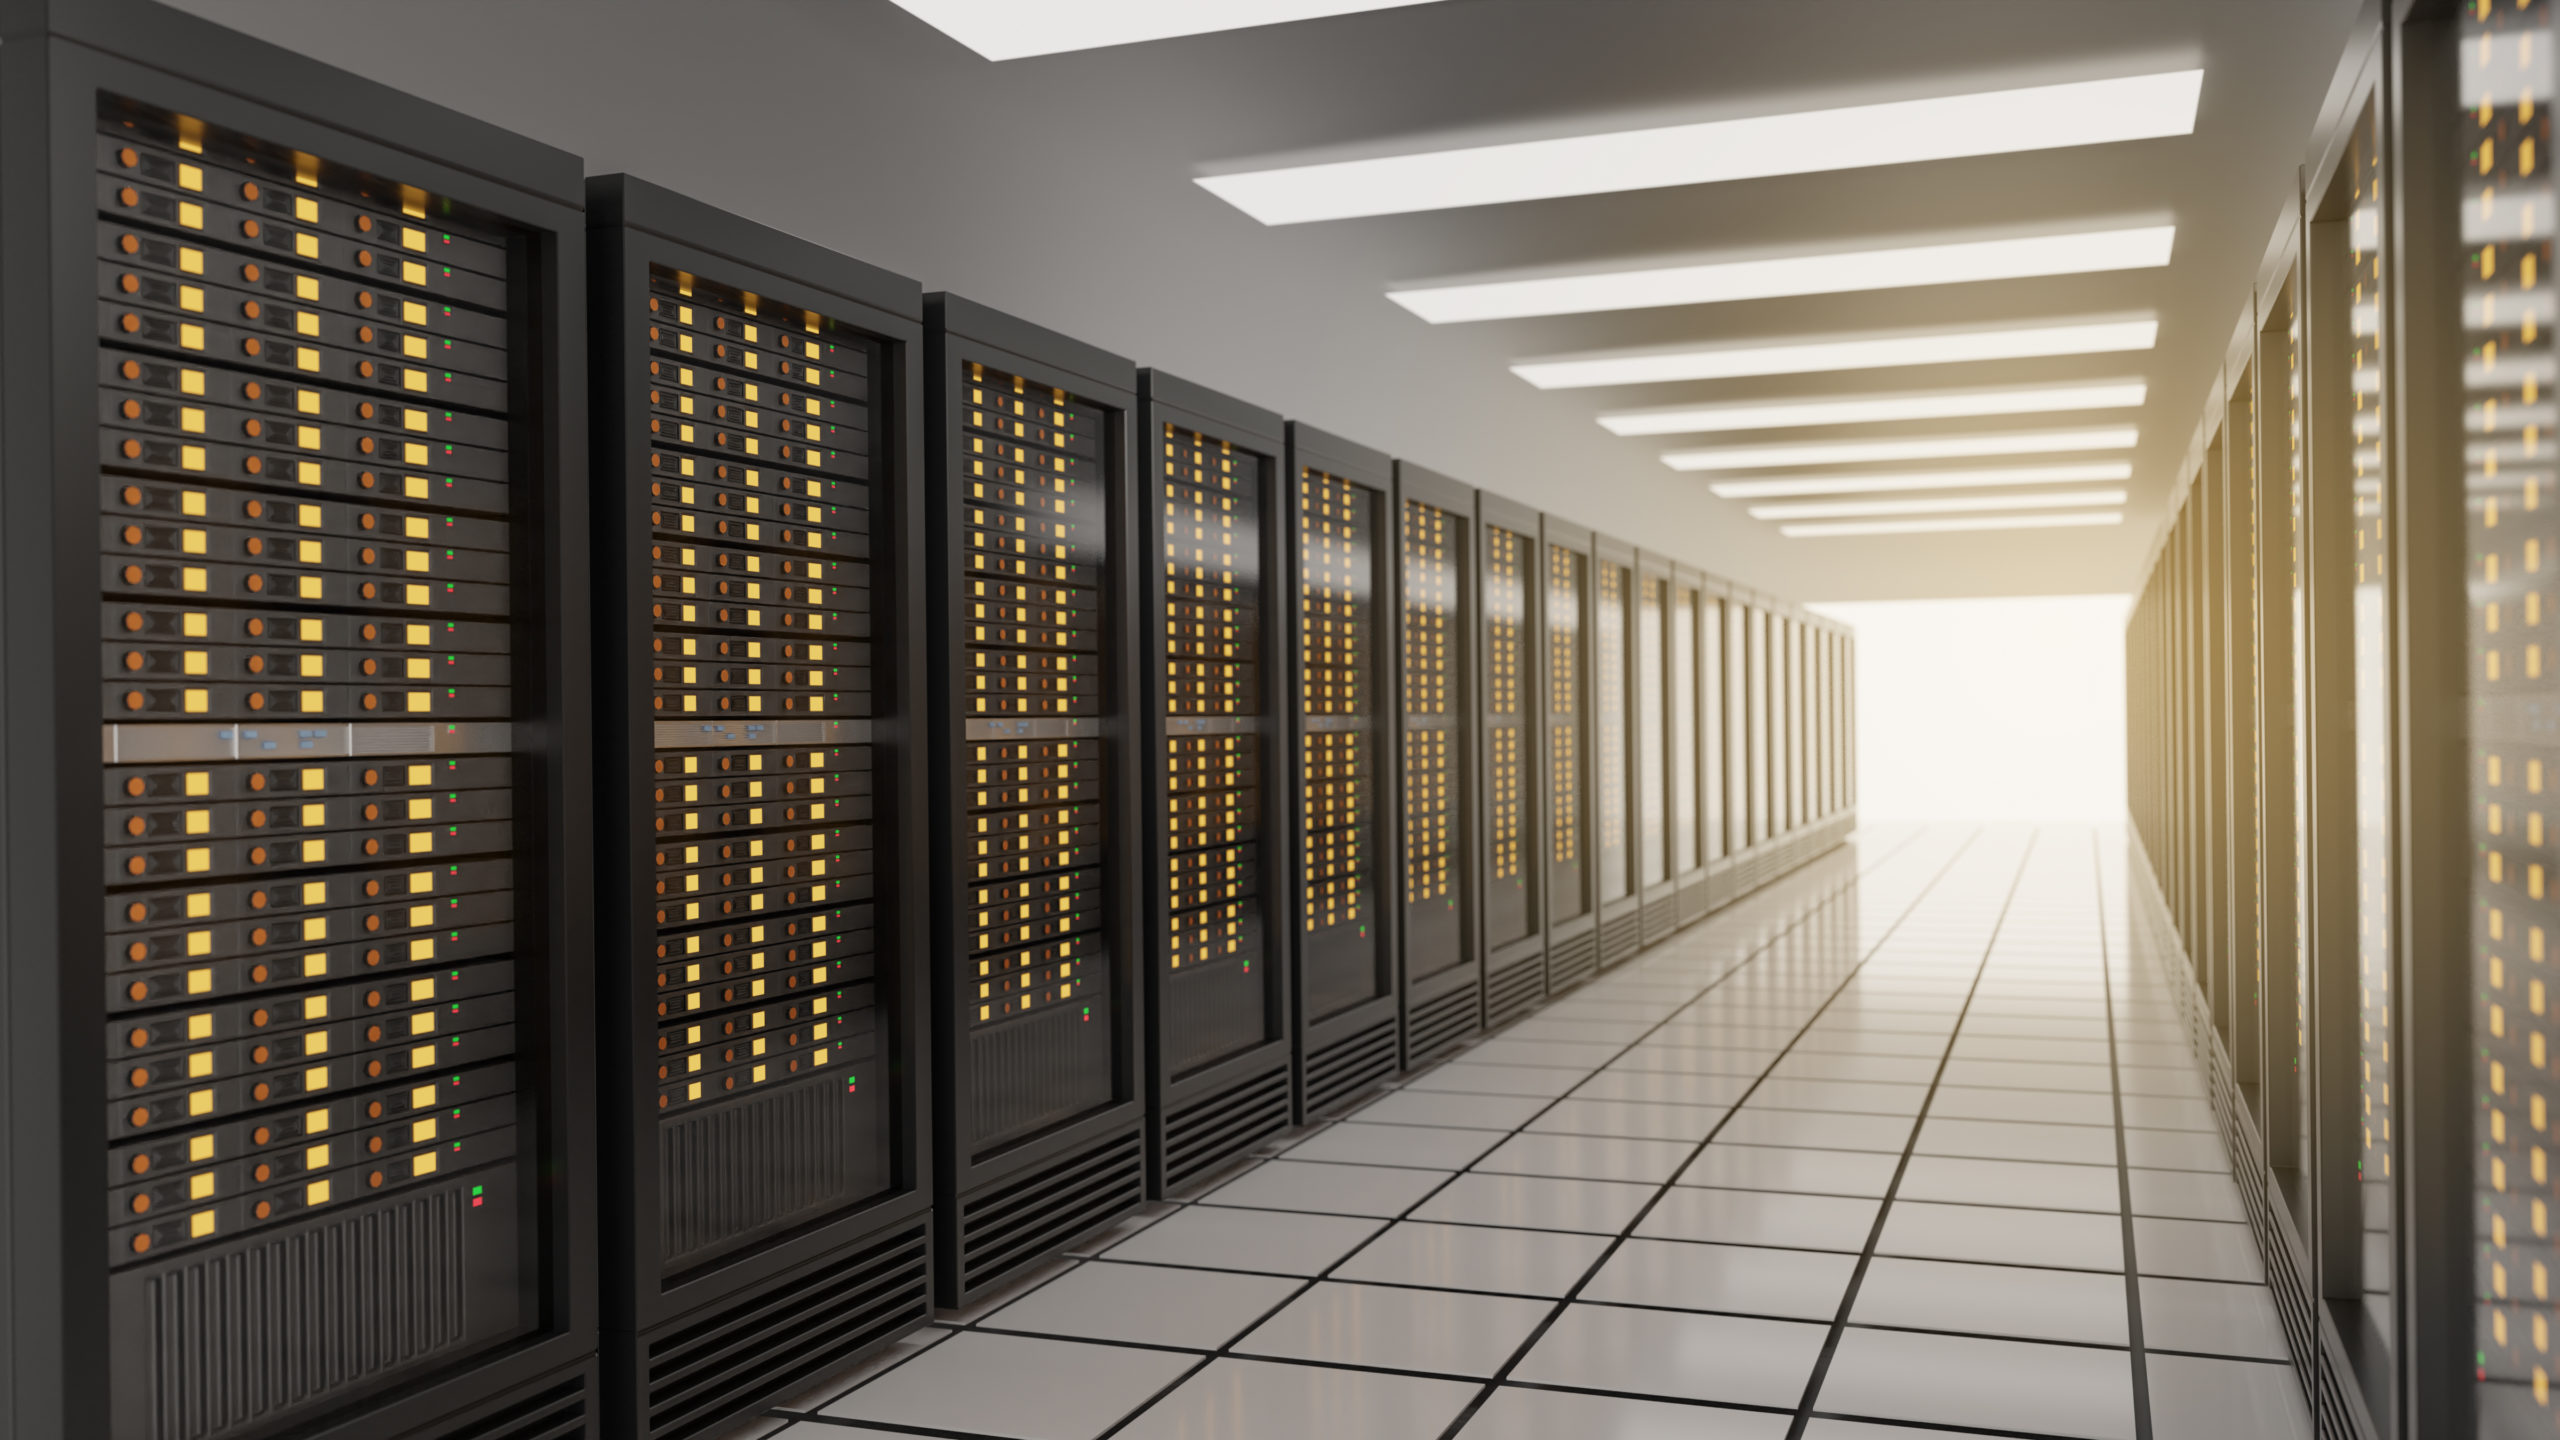 Big datas